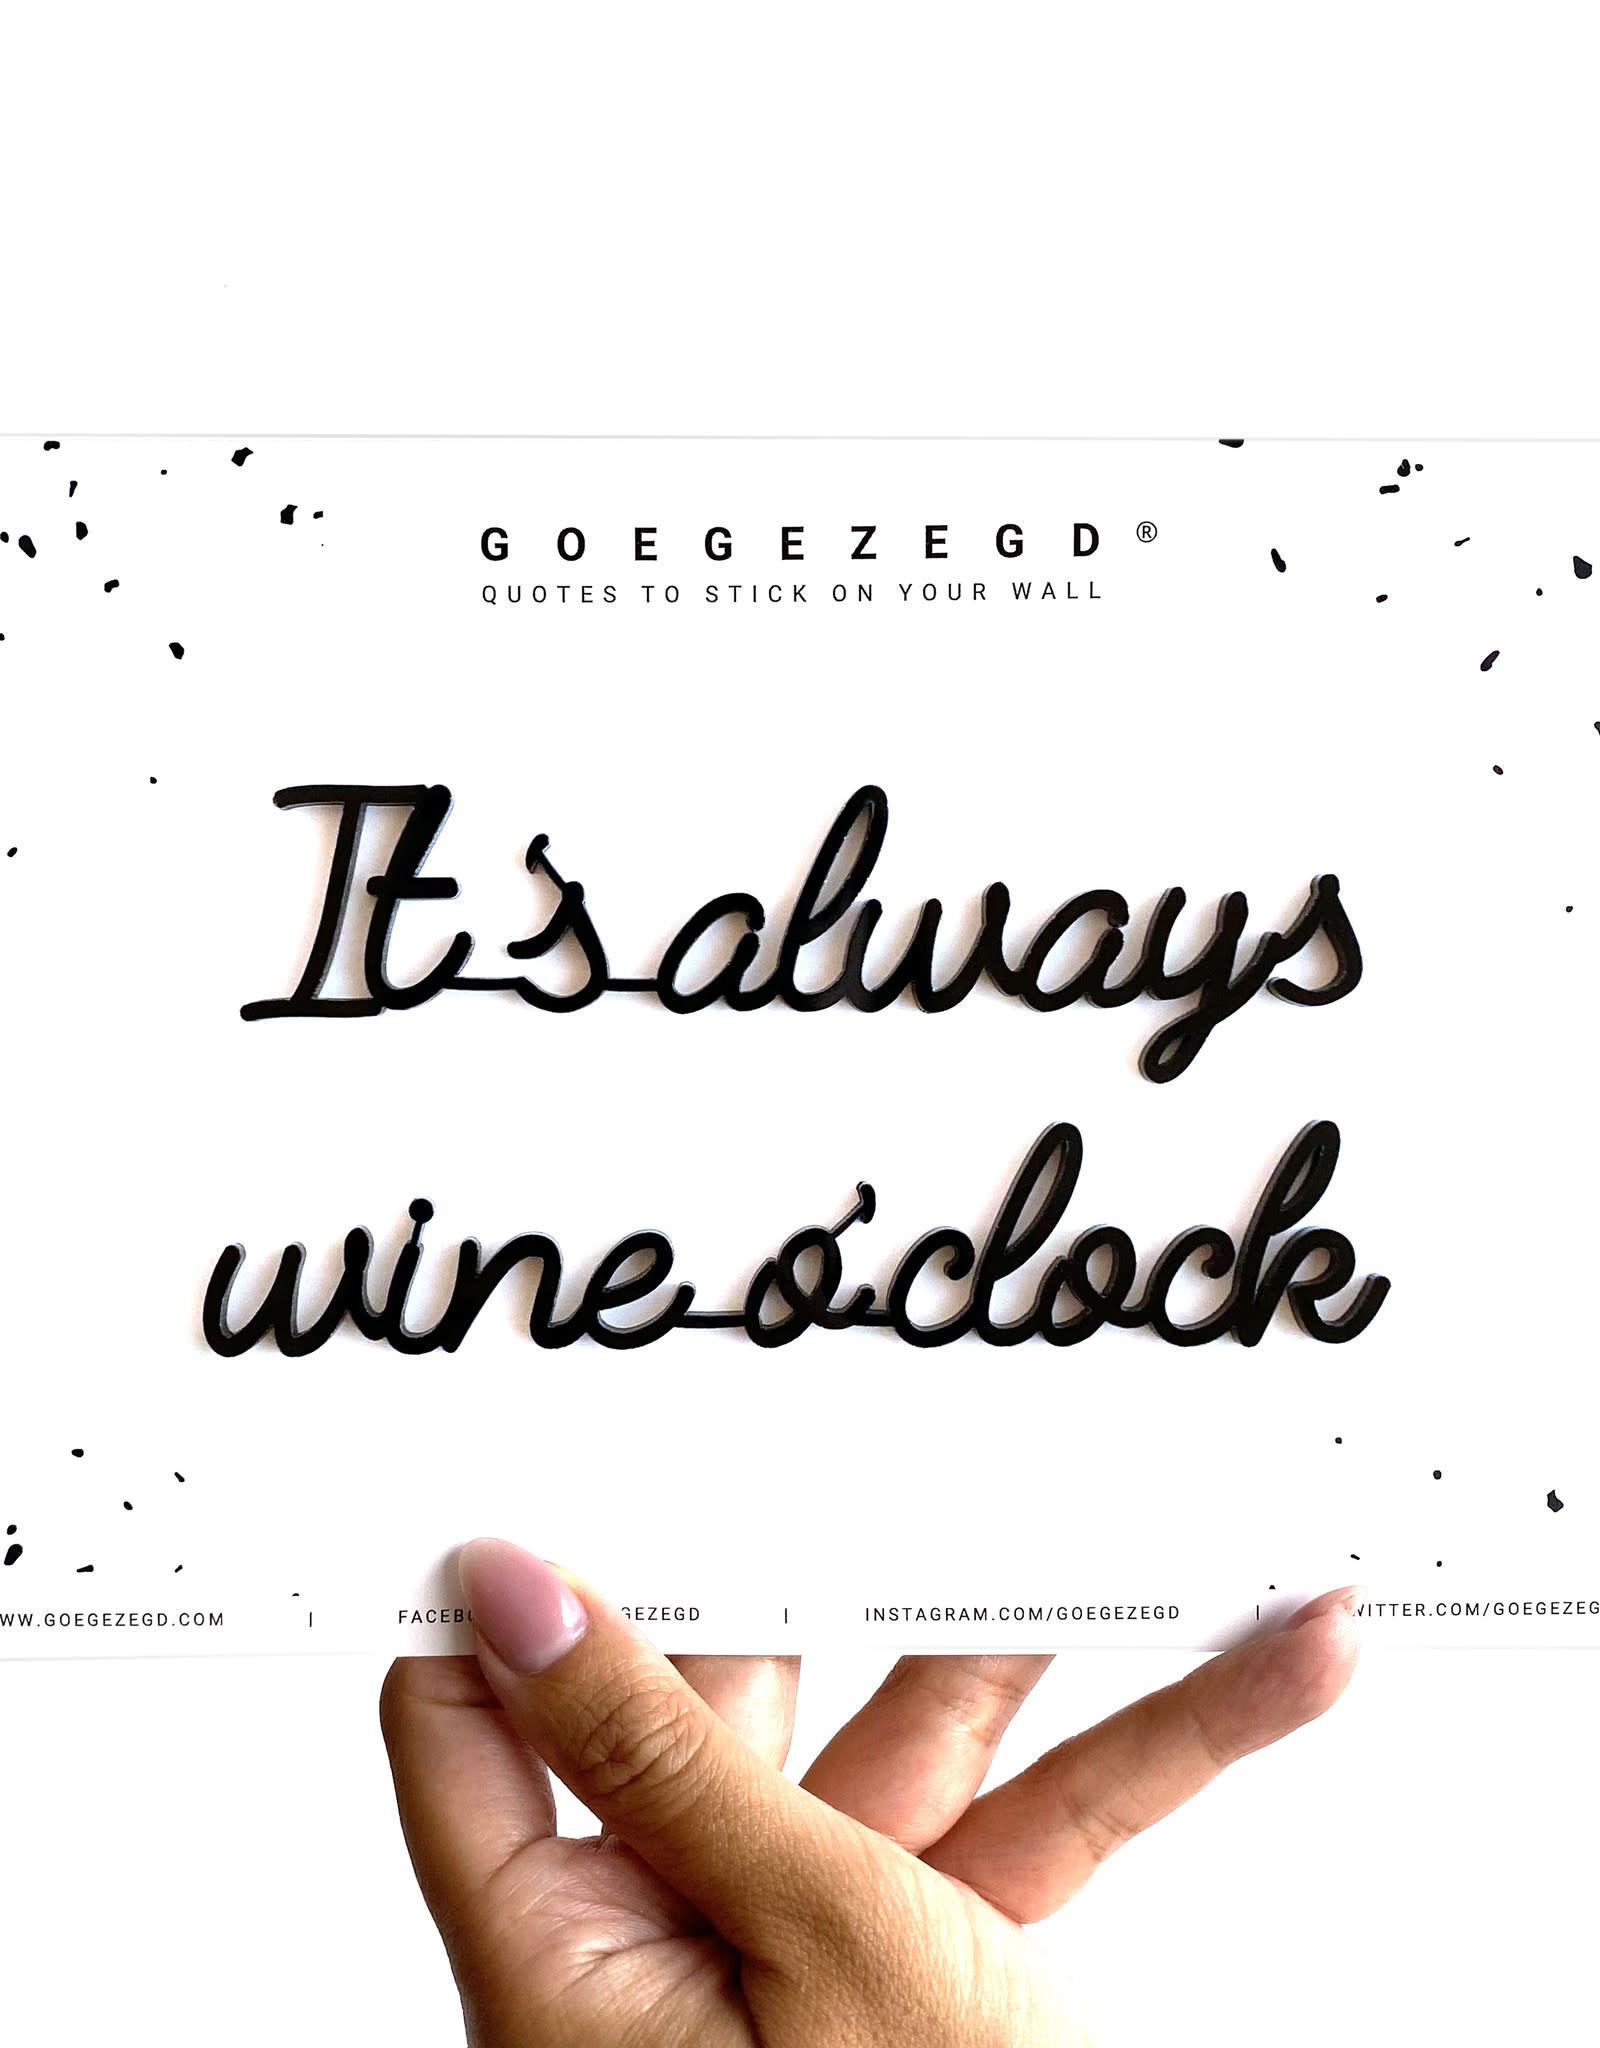 Goegezegd Goegezegd - It's always wine o'clock